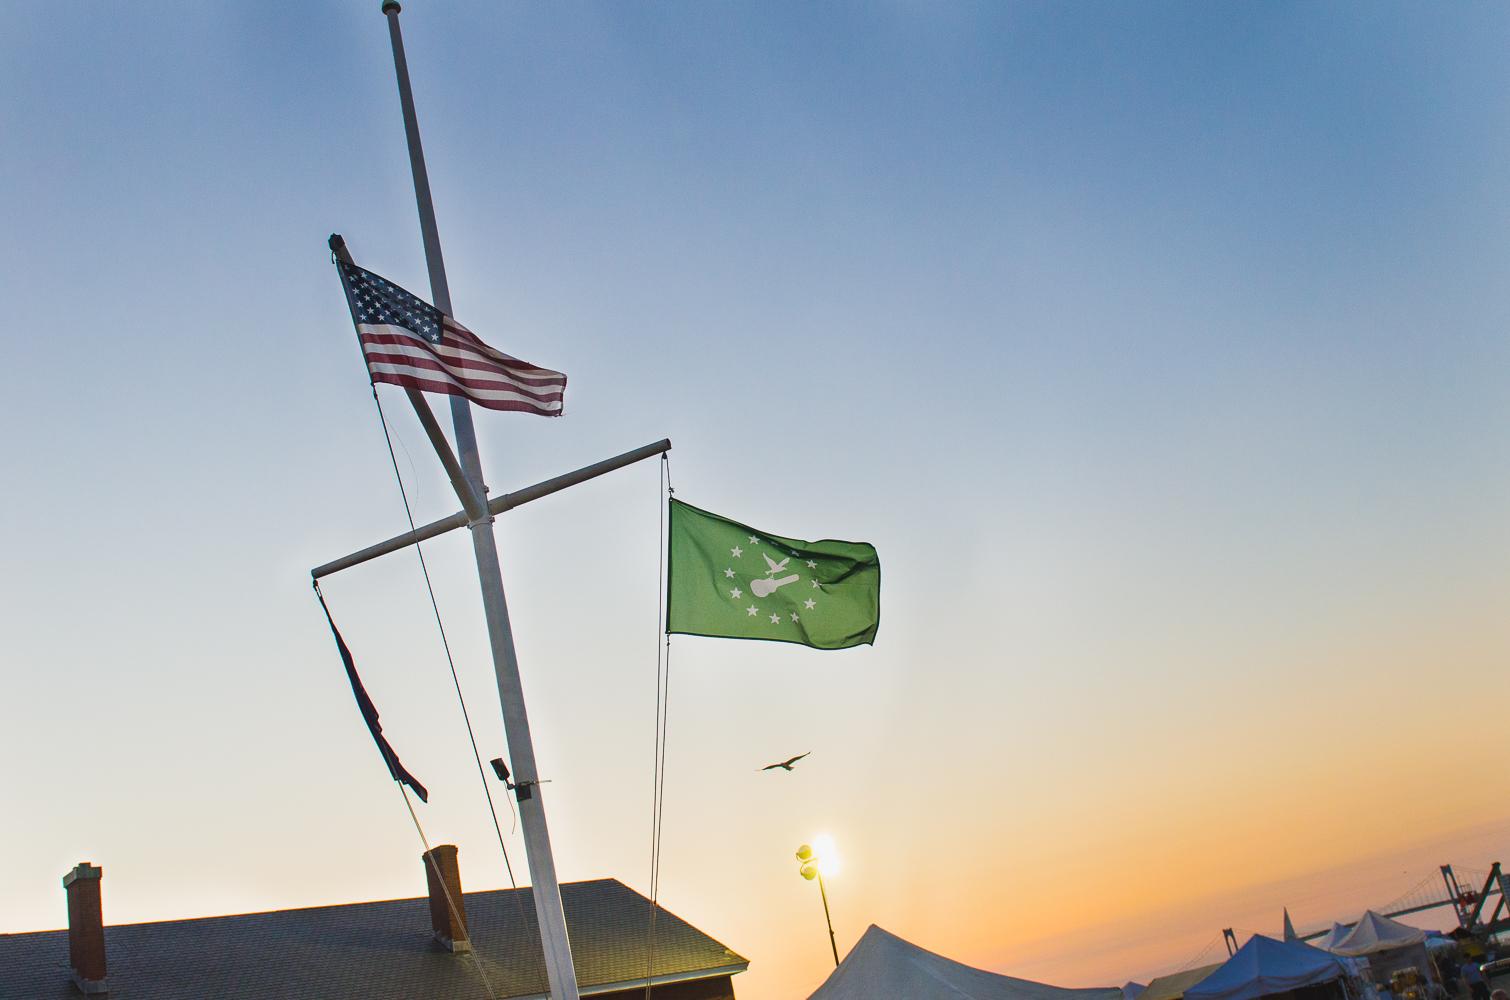 Newport Folk Festival 2018, photo by Ben KayeNewport Folk Festival 2018, photo by Ben Kaye